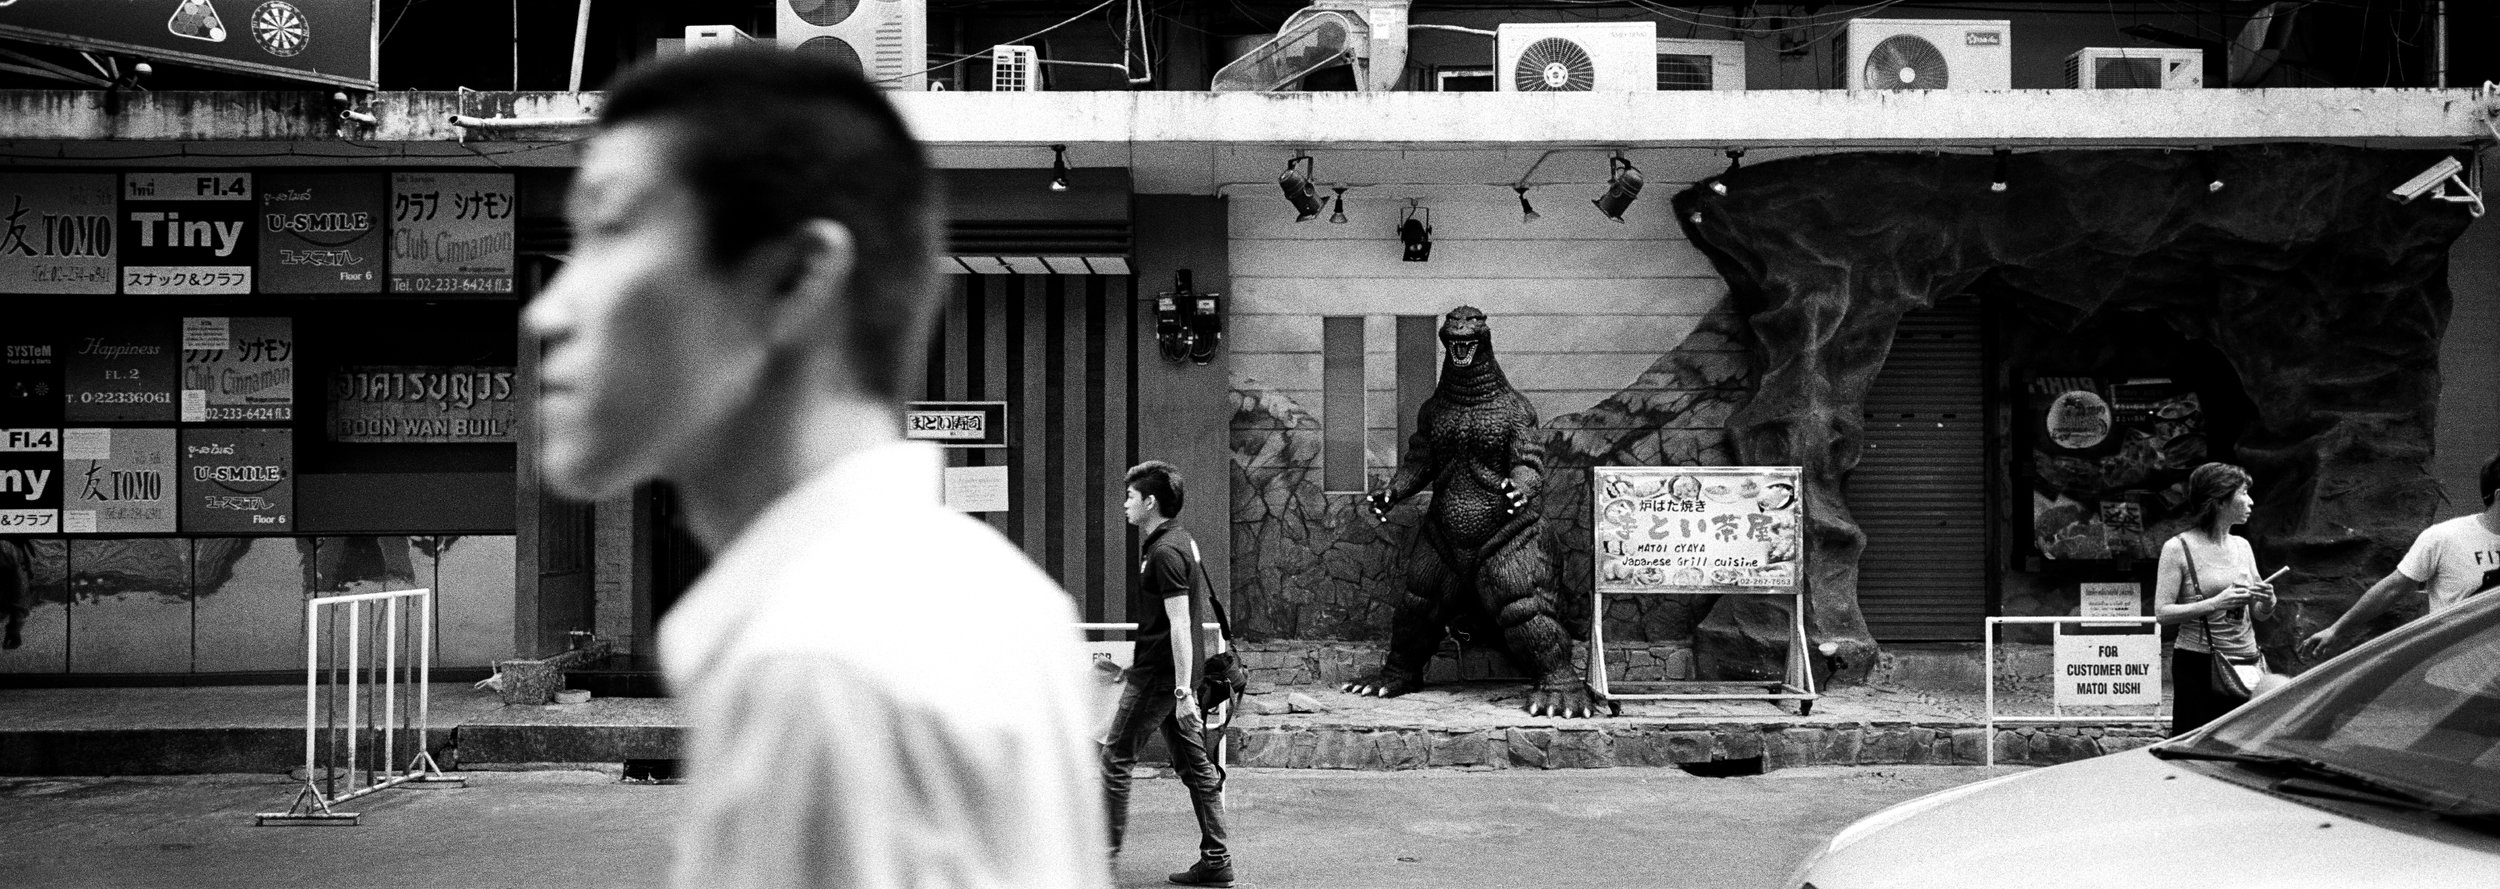 """Godzilla."" Bangkok, Thailand. 2014"